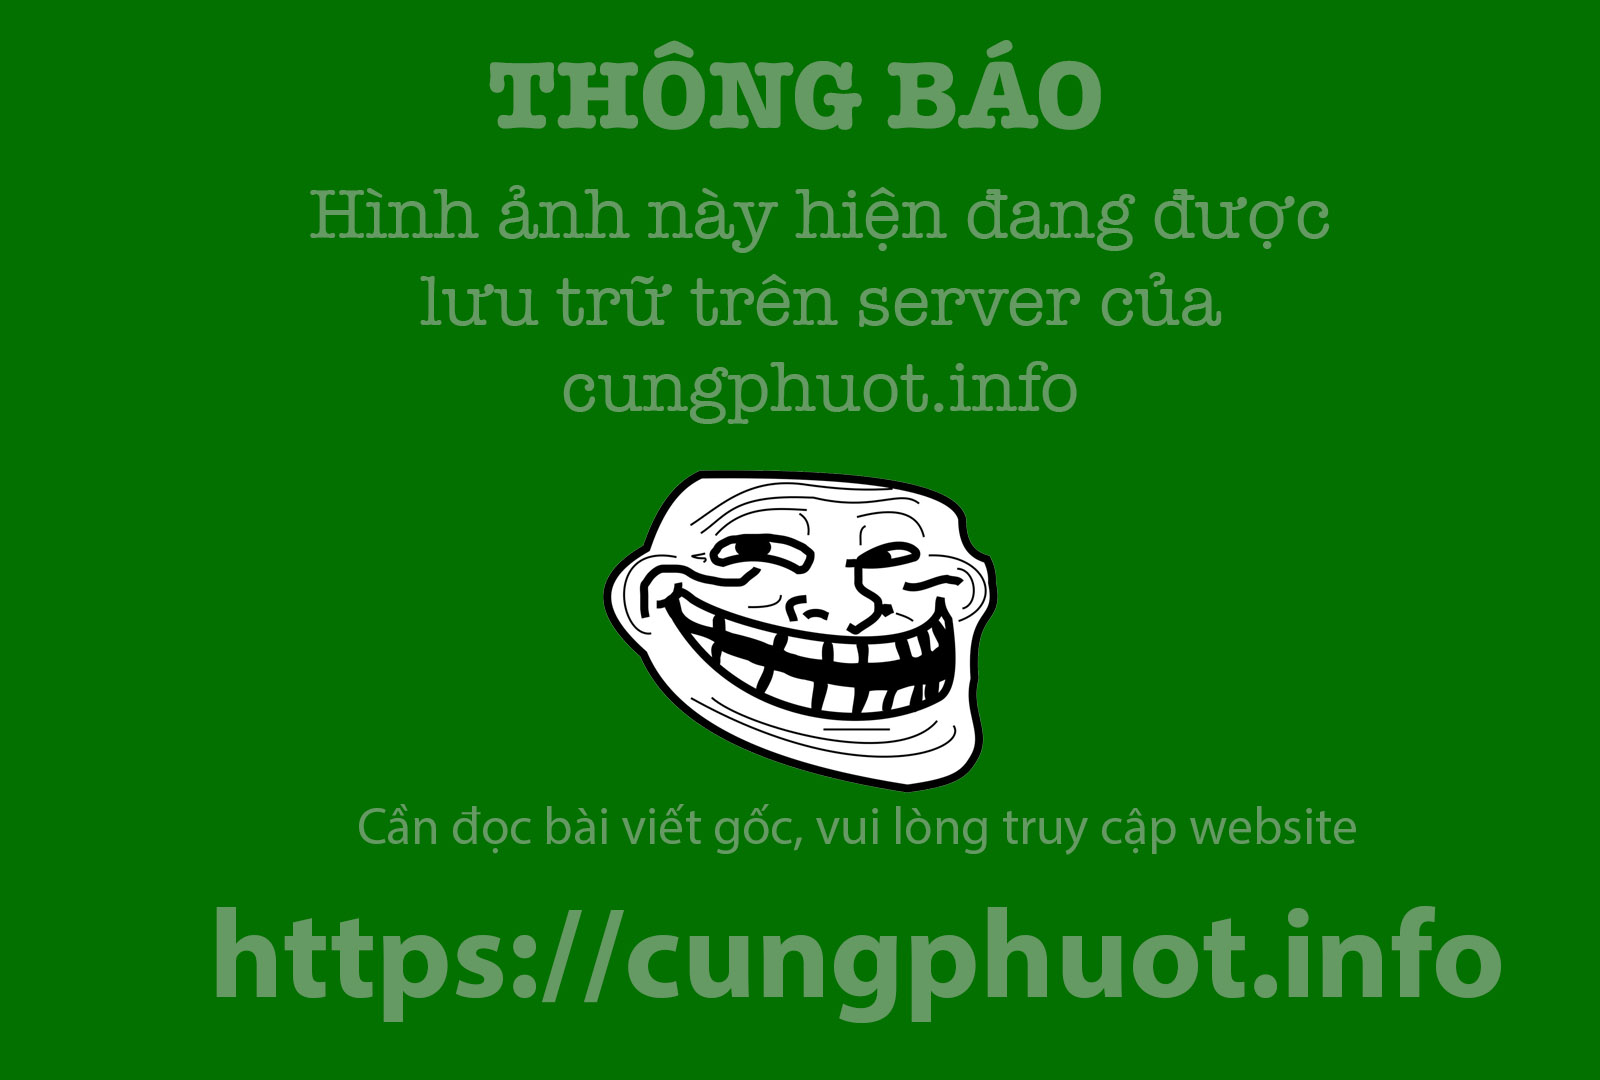 Co do Lam Kinh nhin tu tren cao hinh anh 1